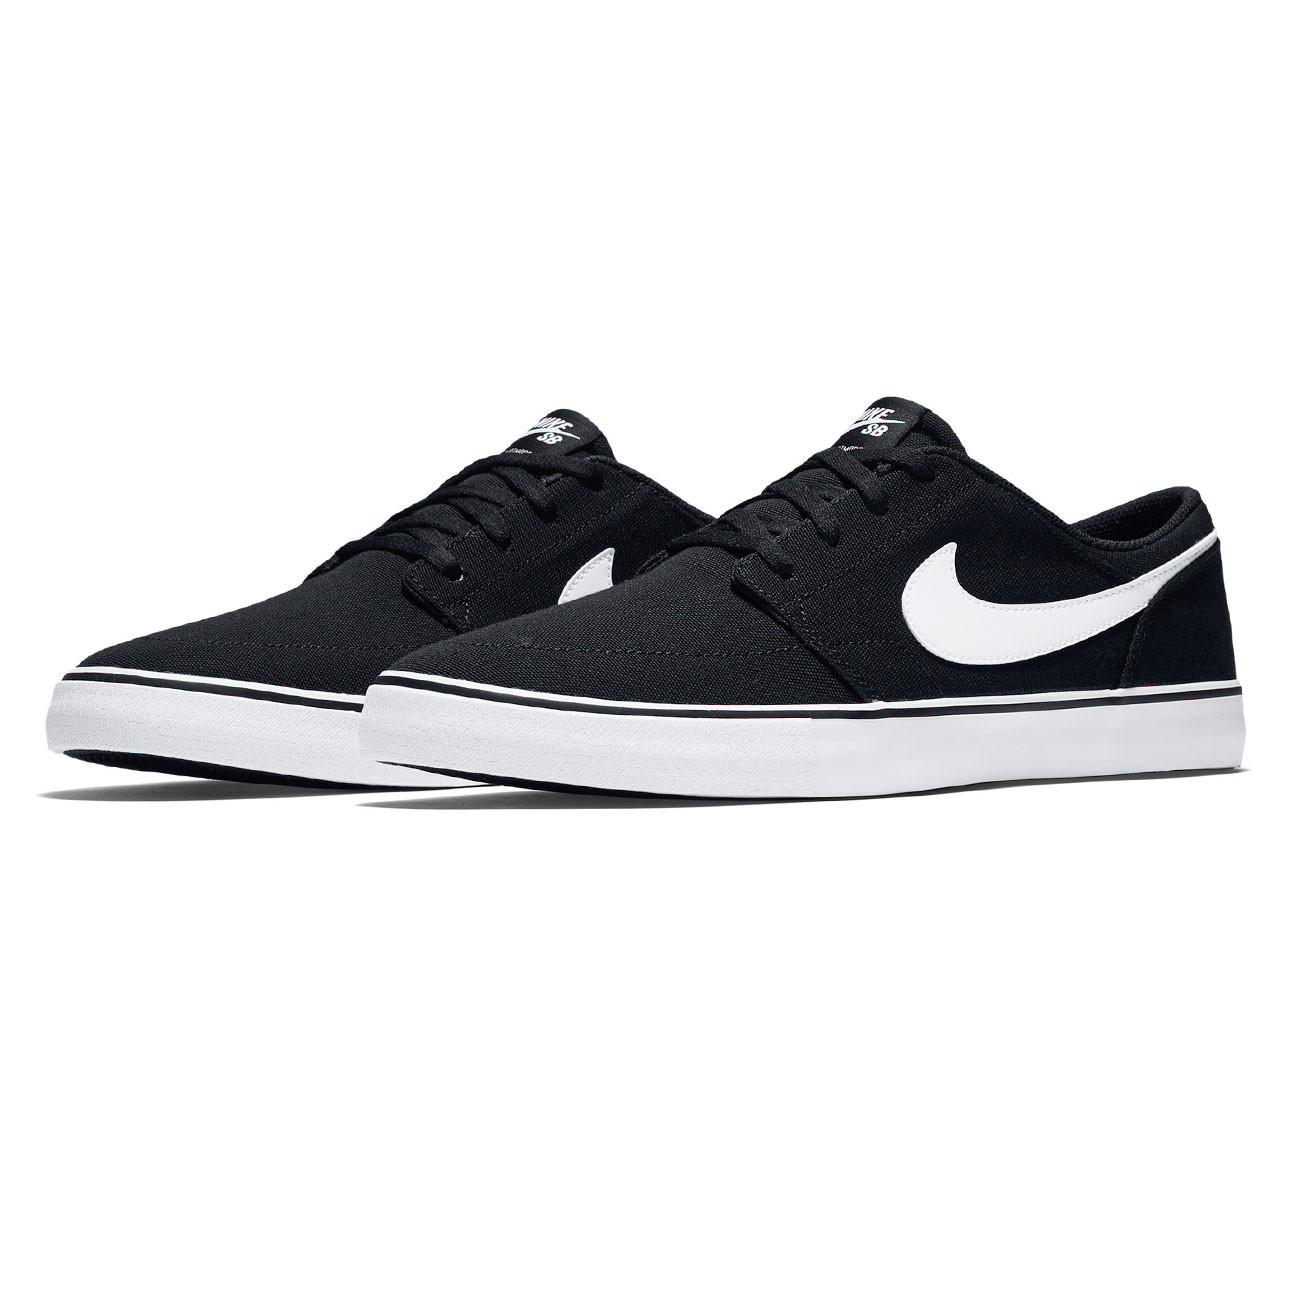 Sneakers Nike SB Solarsoft Portmore II